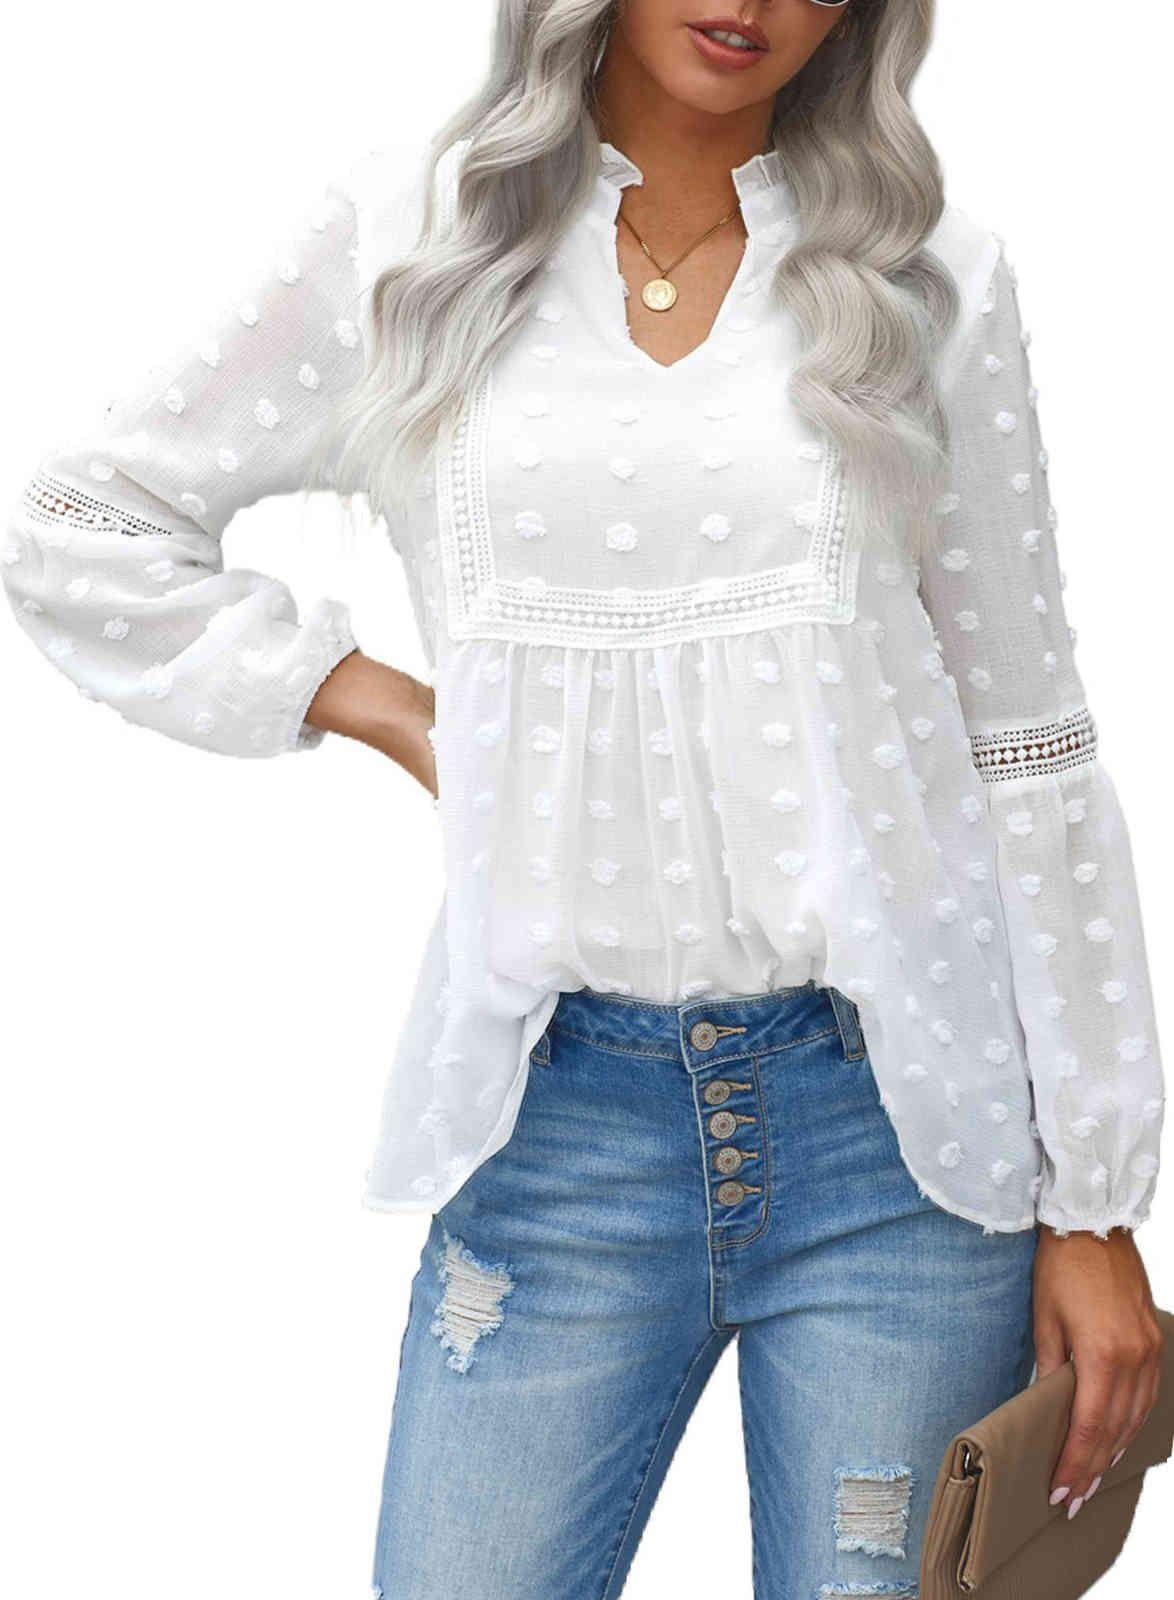 2021 shirt women's autumn pure color wool ball decoration V-neck Pullover women's lace shirt T-shirt